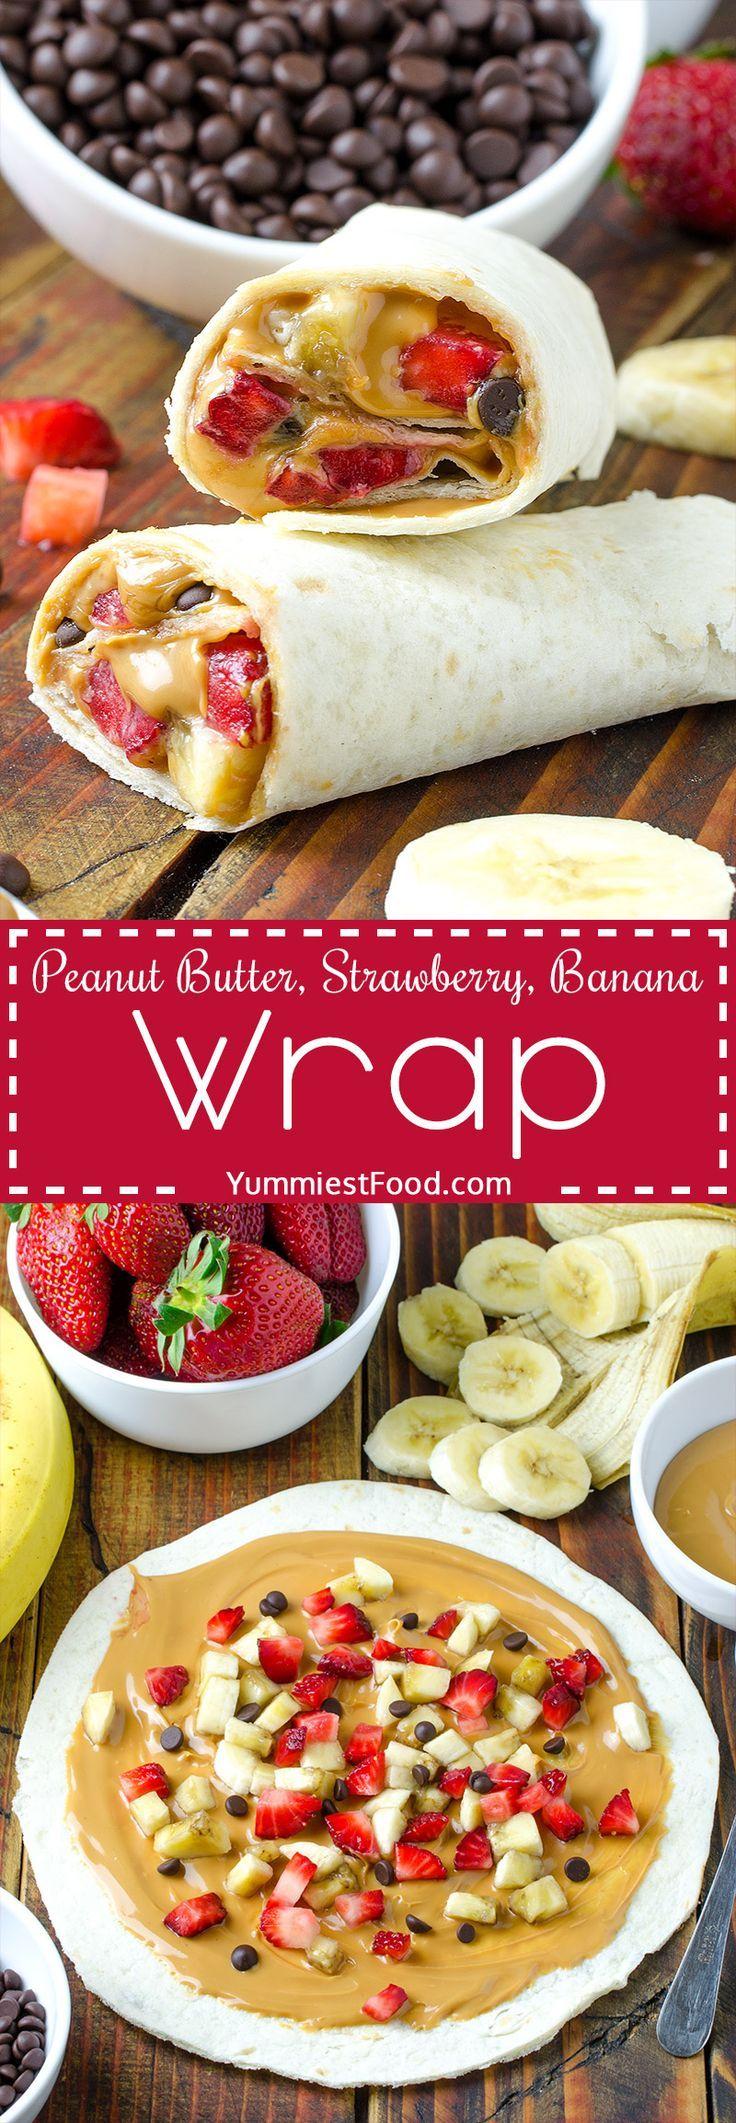 Healthy Peanut Butter, Strawberry, Banana Wrap